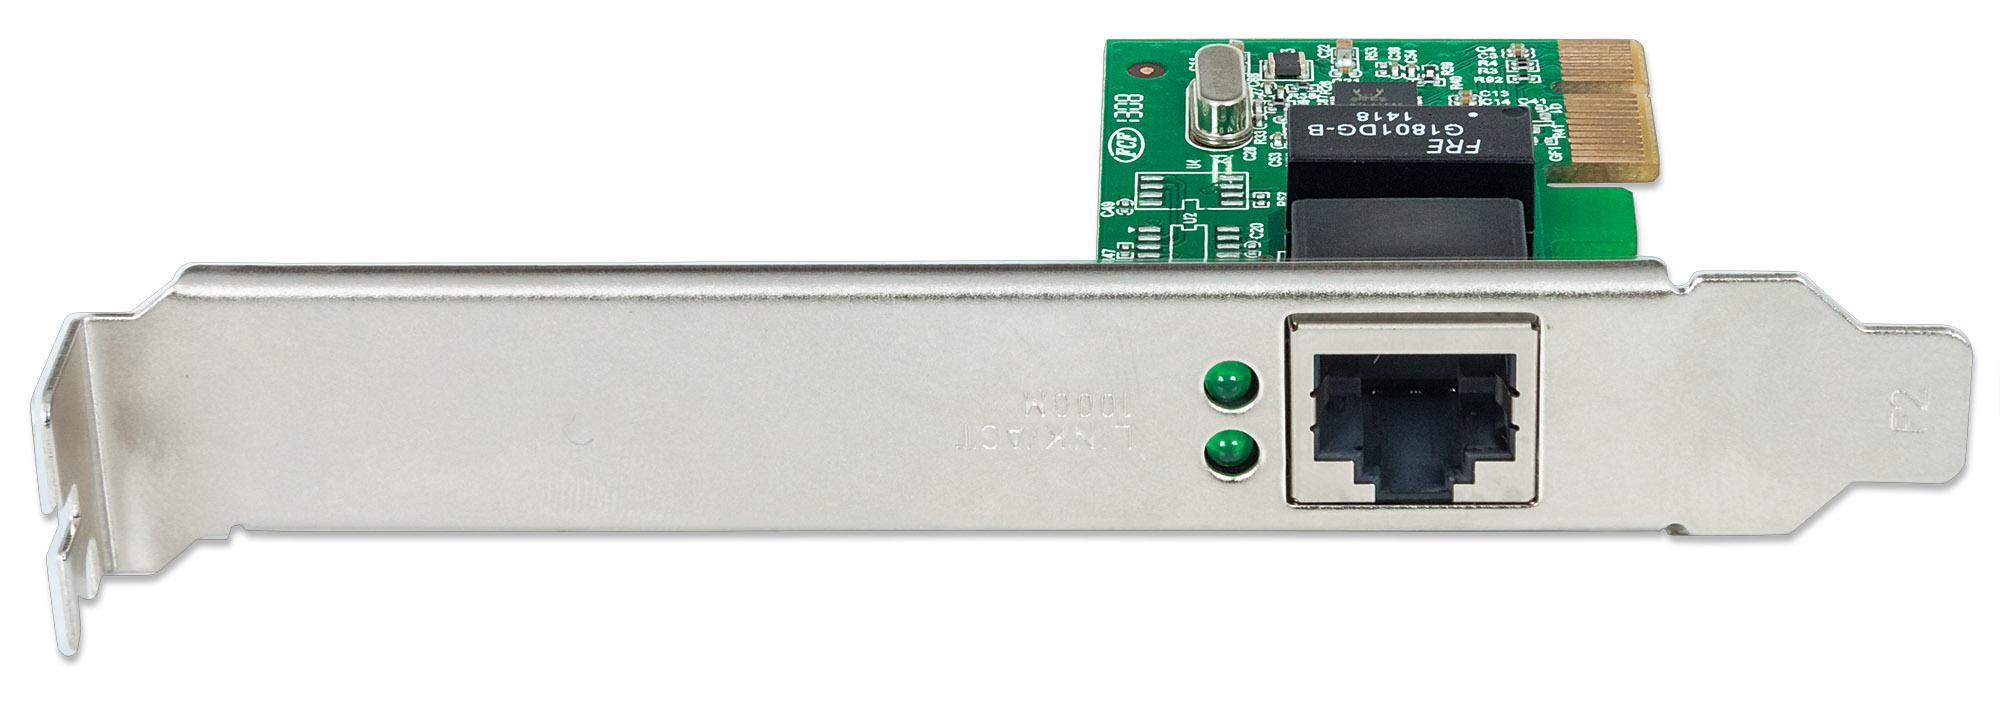 Gigabit PCI Express Network Card